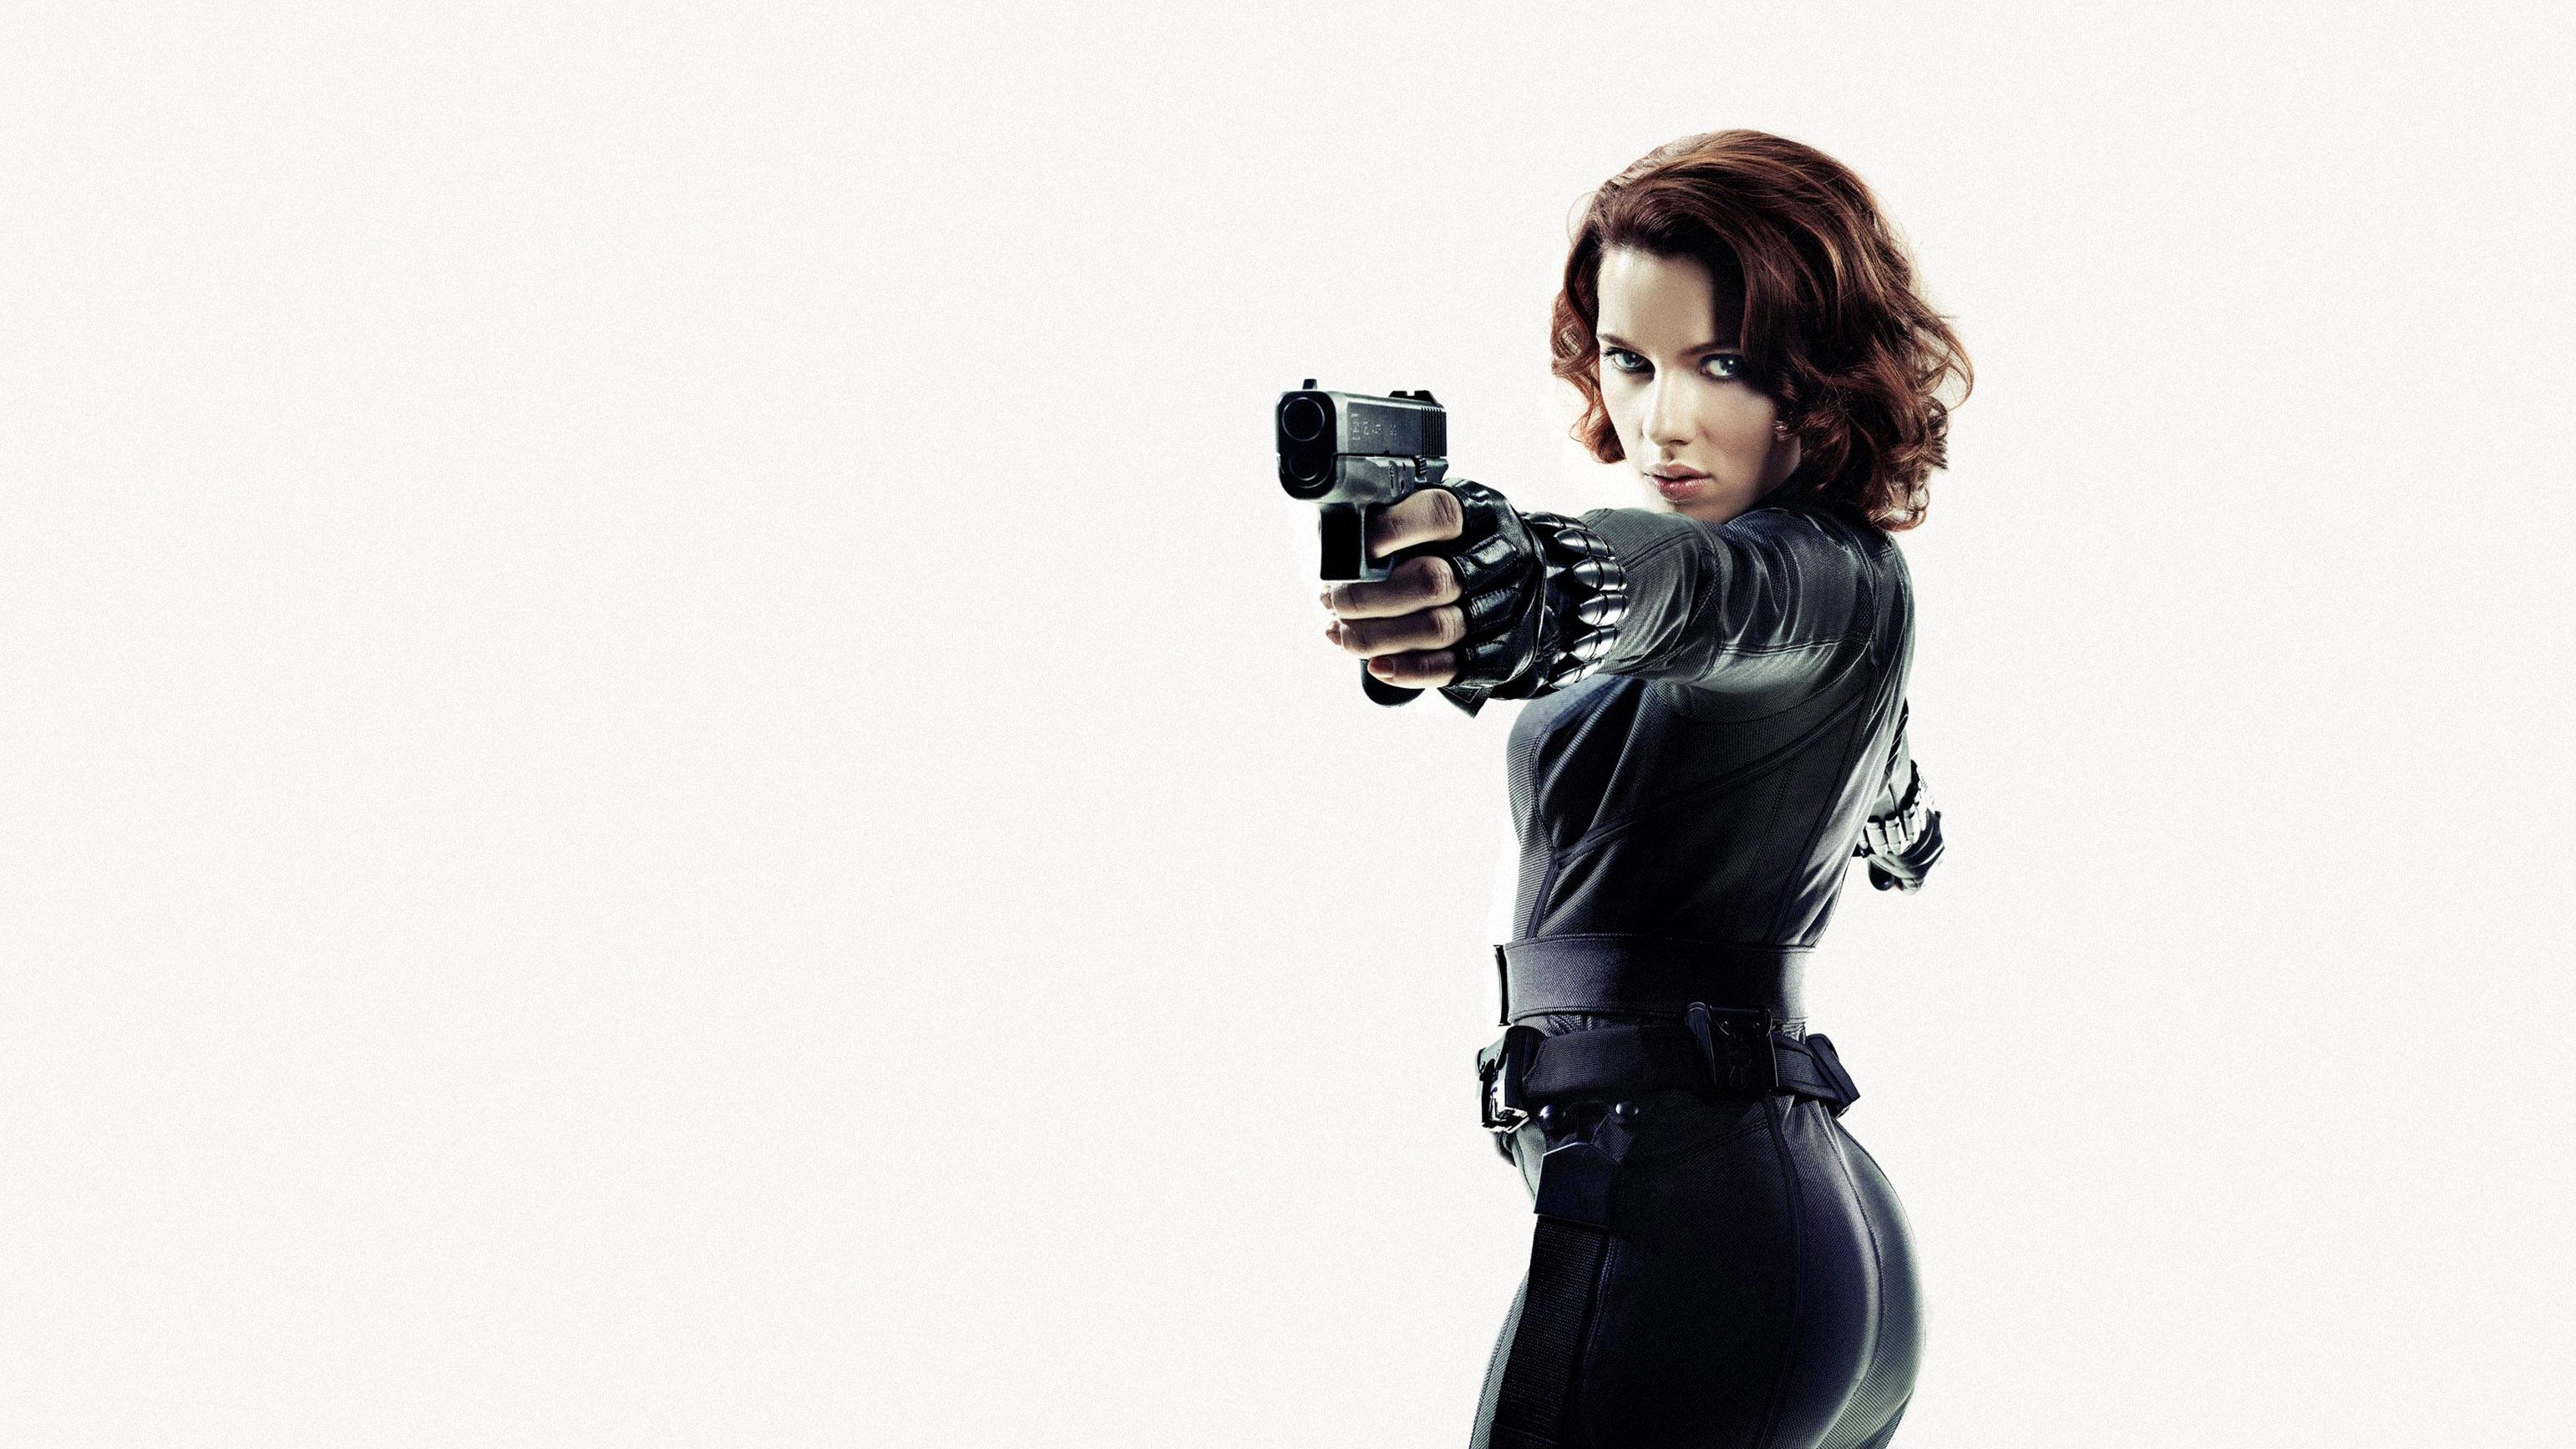 Wallpaper : Marvel Cinematic Universe, Black Widow, Scarlett